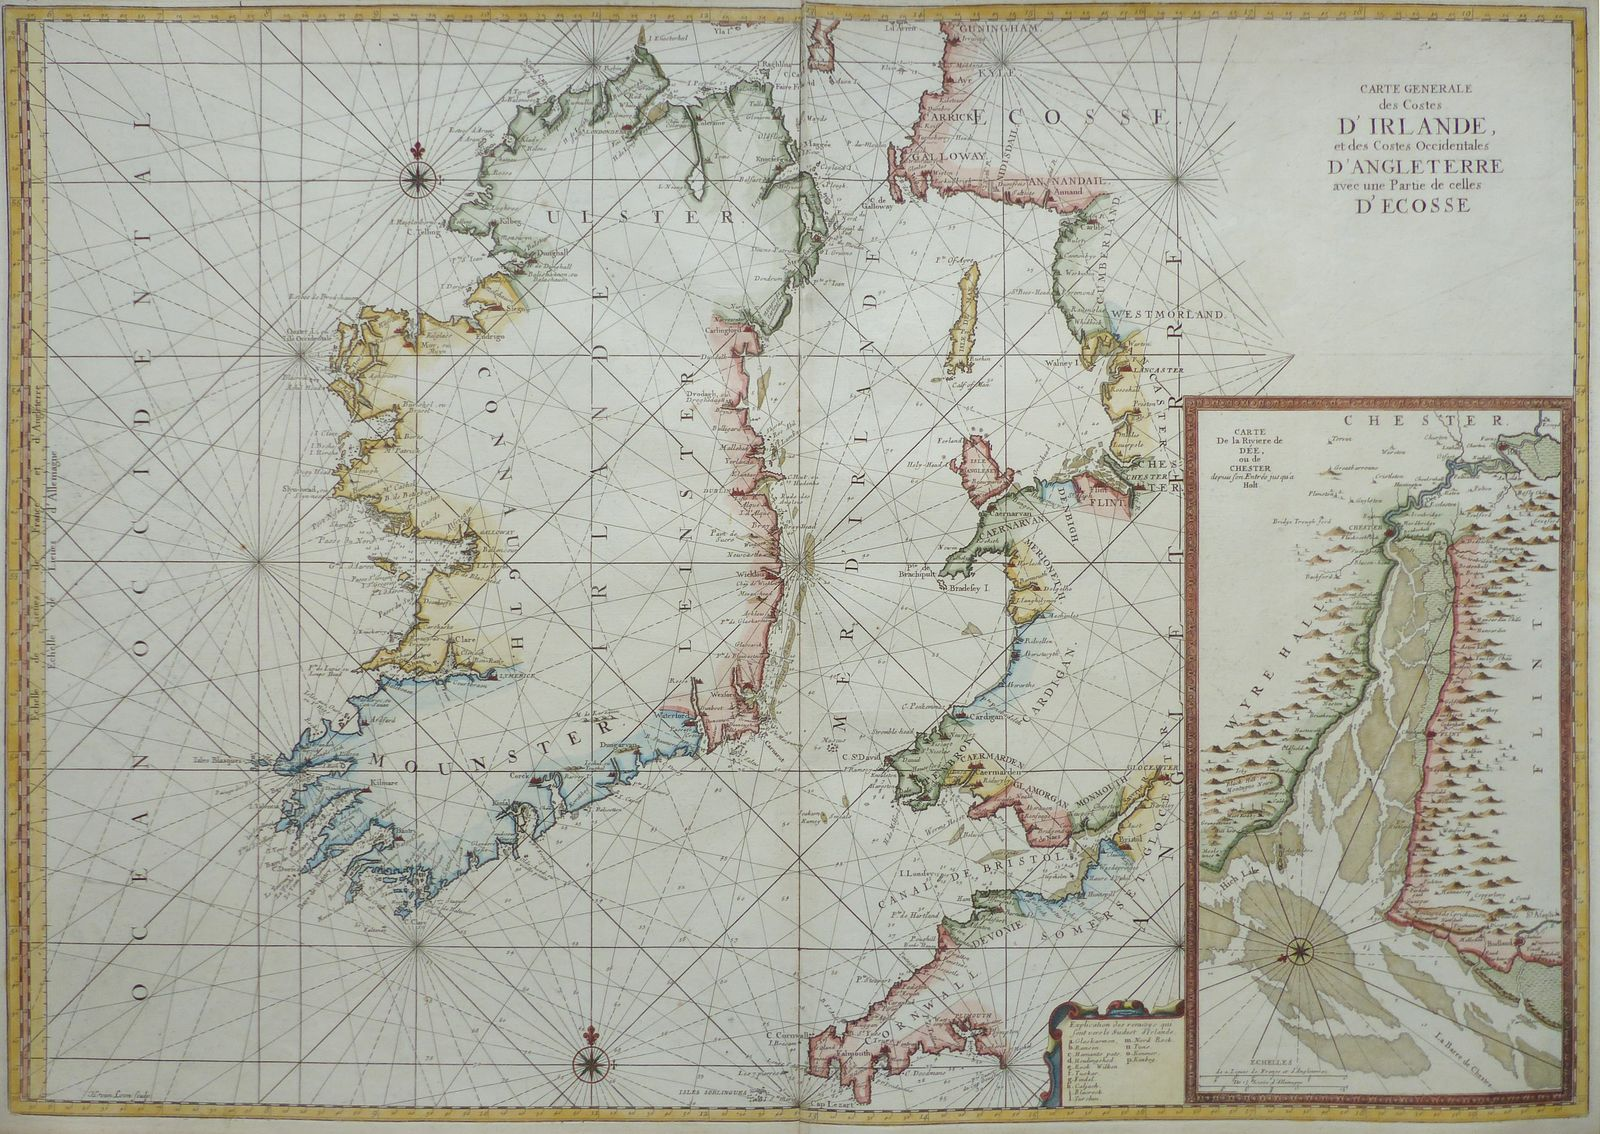 Carte Angleterre Maps.Jonathan Potter Map Carte Generale Des Costes D Irlande